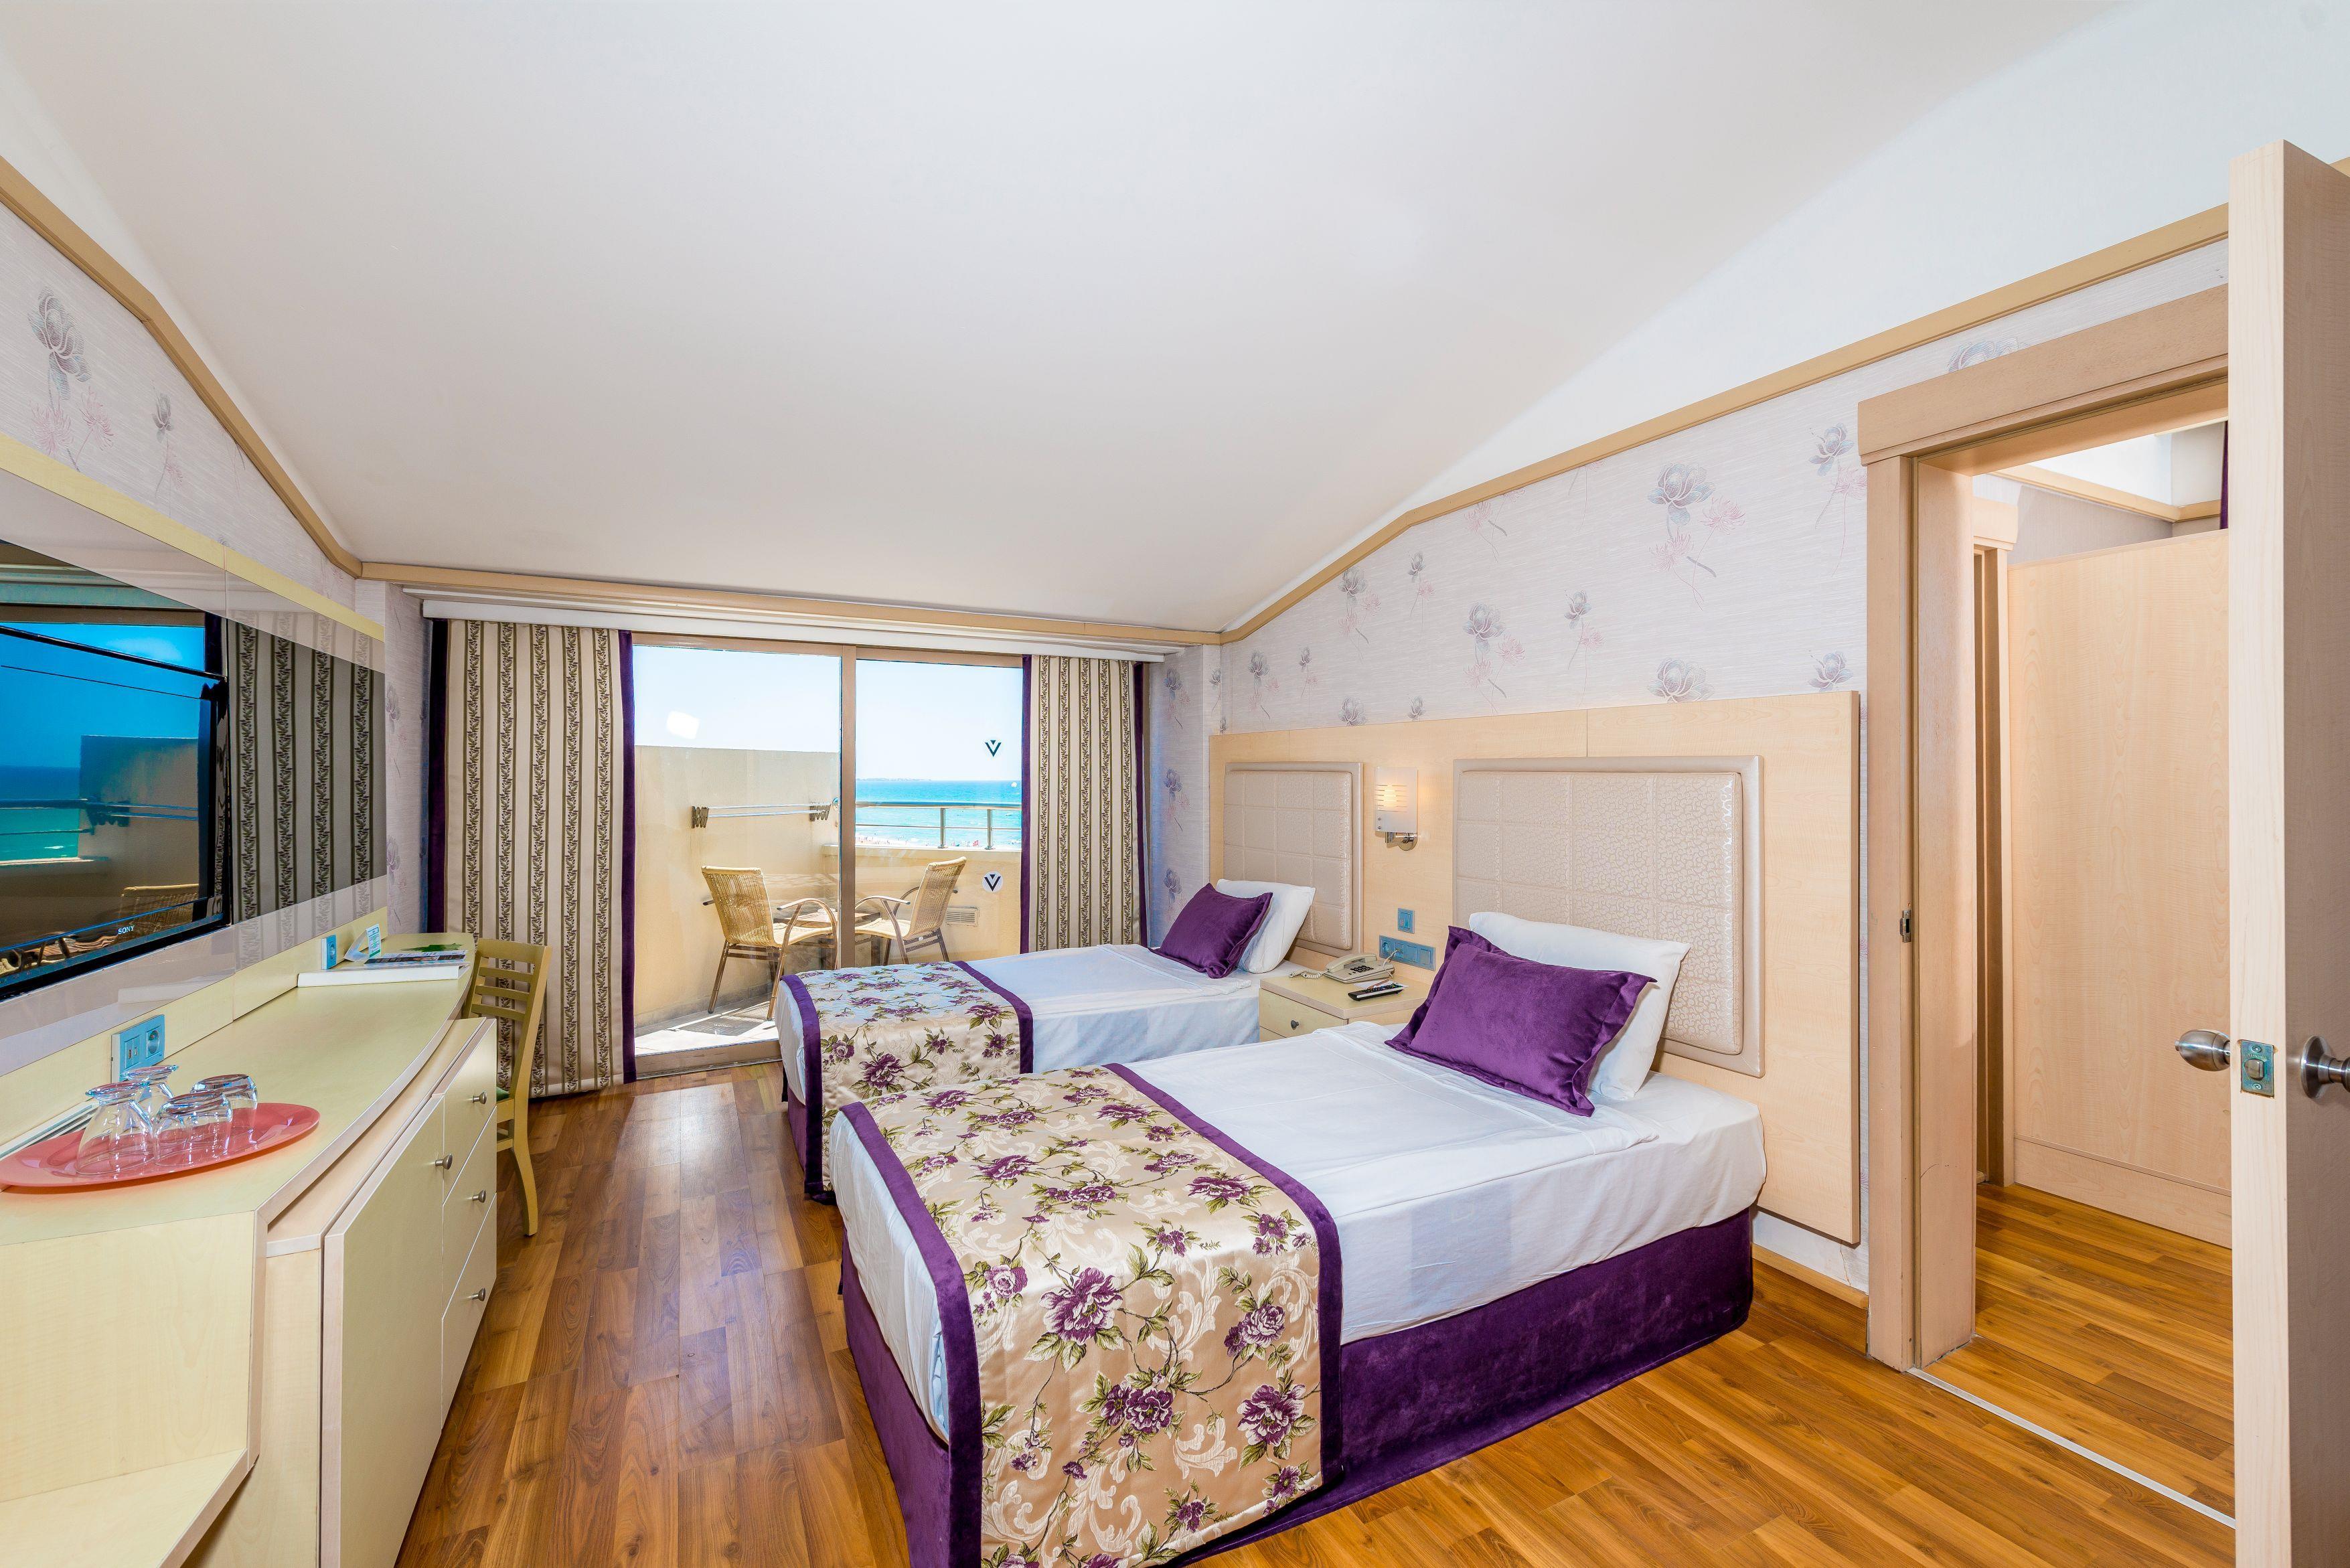 http://www.orextravel.sk/OREX/hotelphotos/vonresort-golden-coast-general-0020.jpg